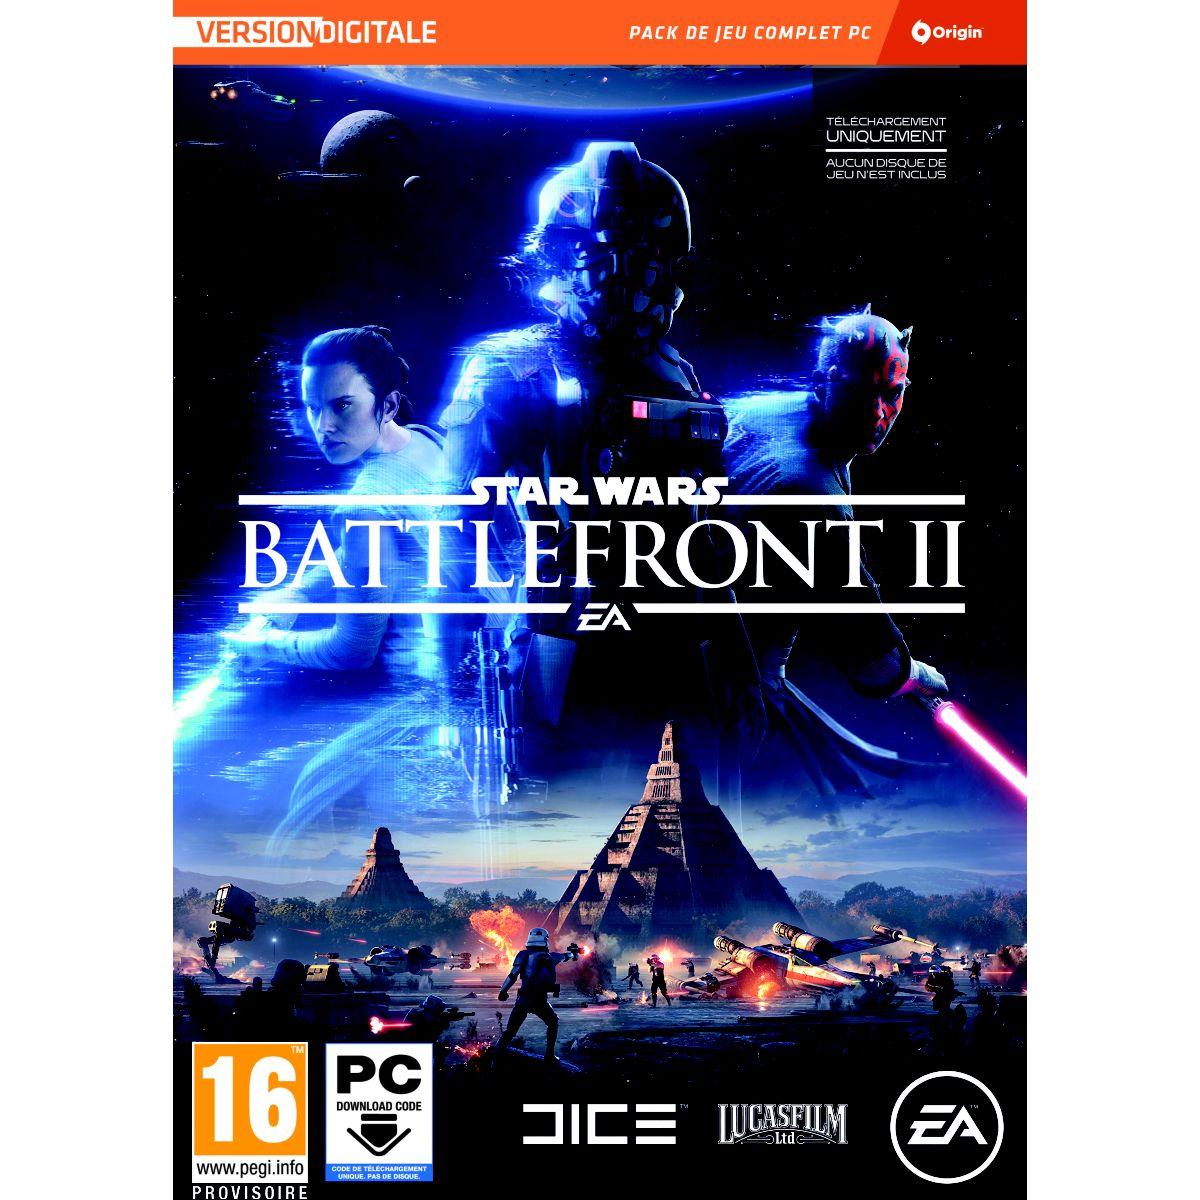 Jeu PC ELECTRONIC ARTS Star Wars Battlefront II (photo)